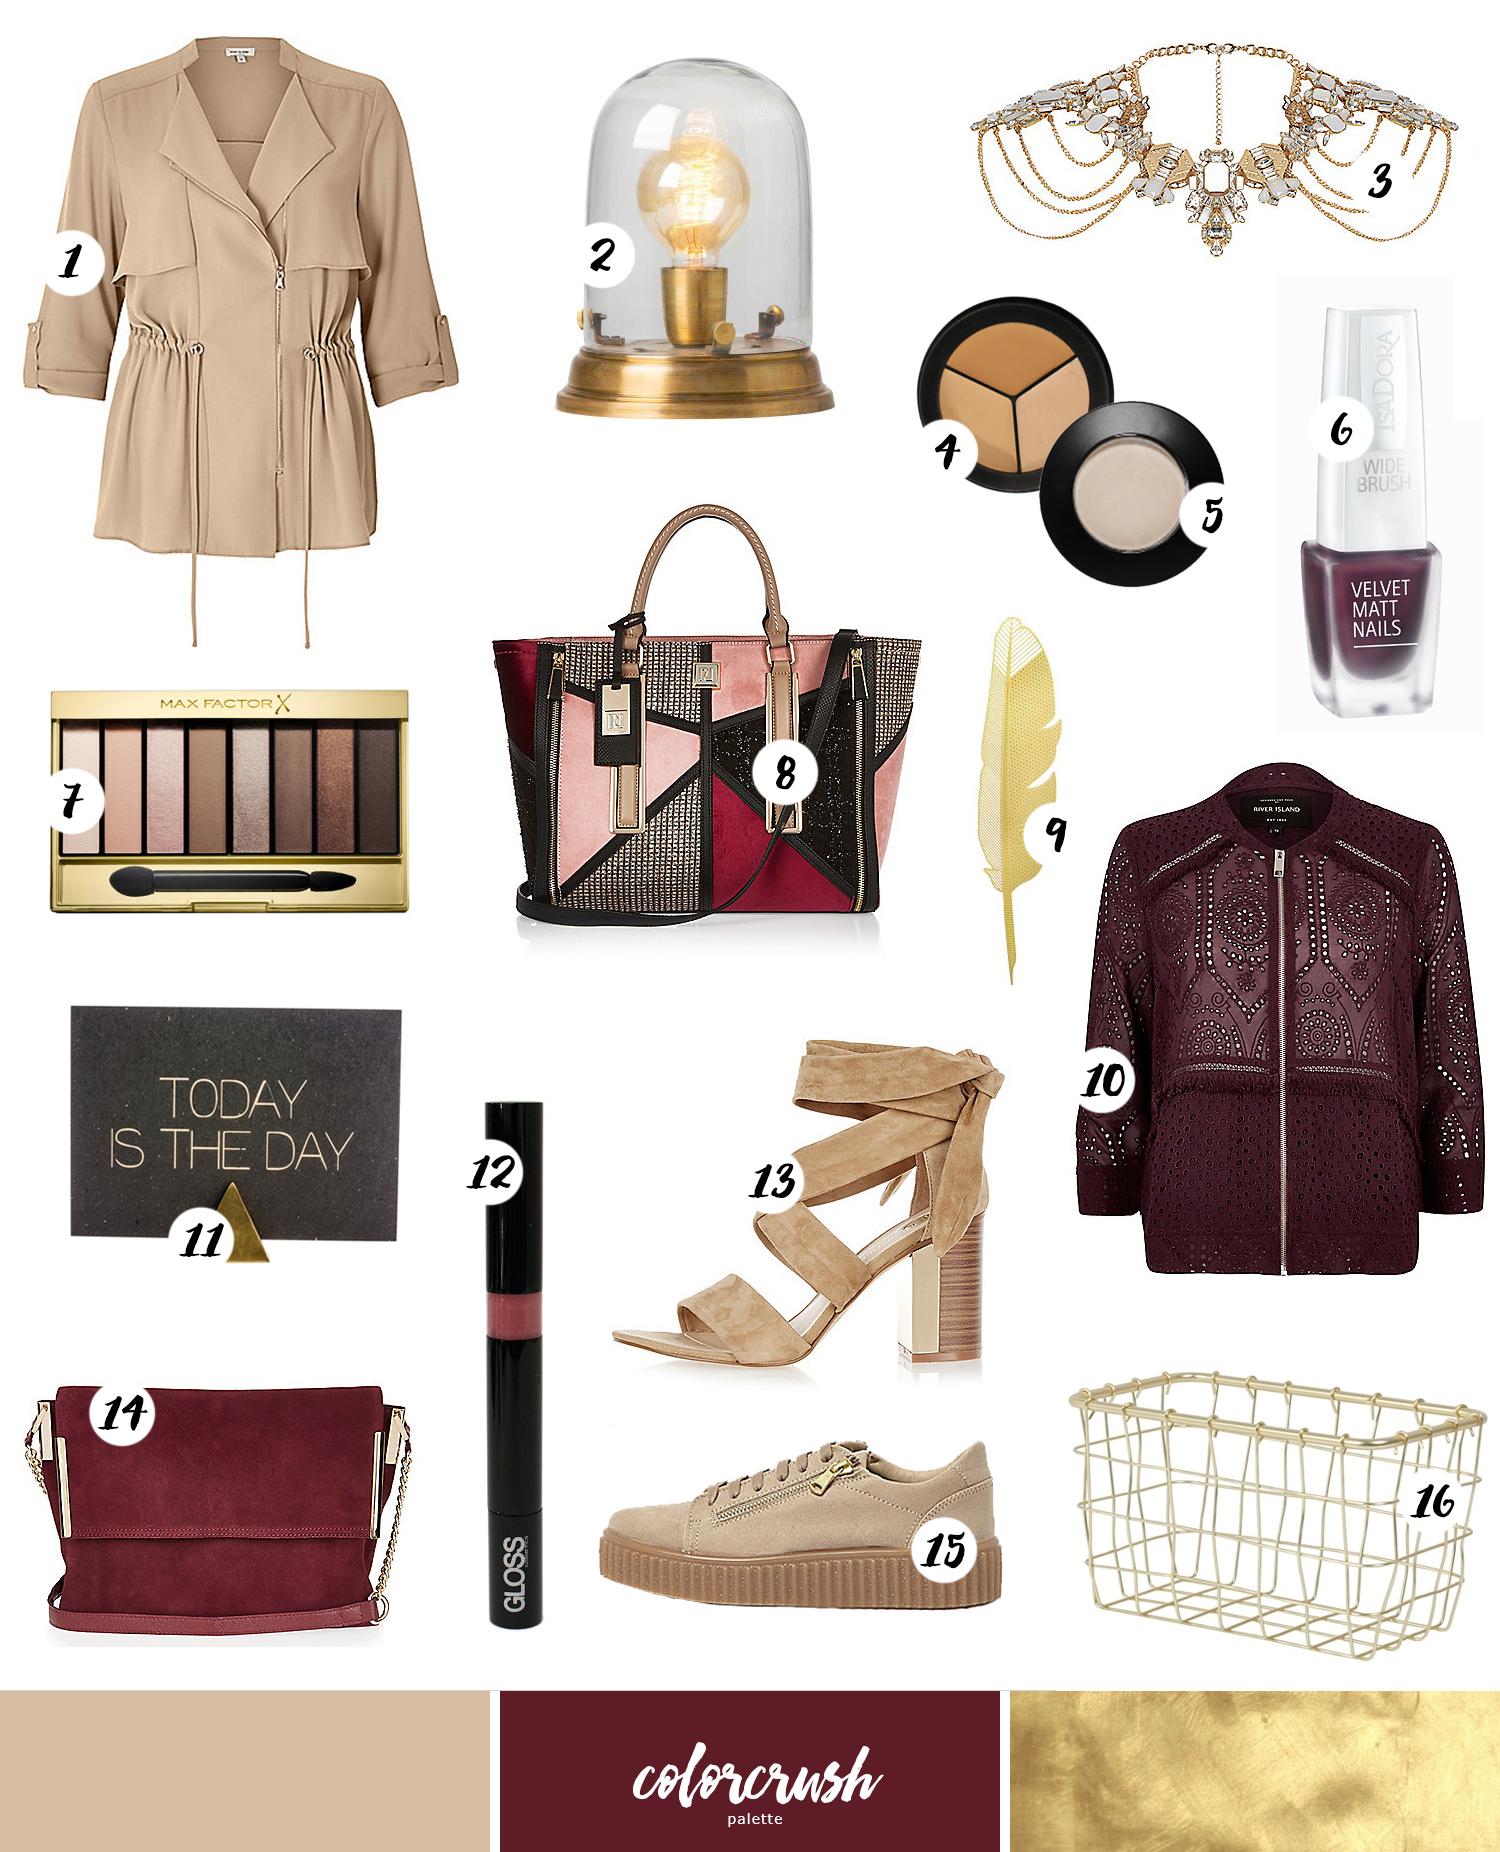 ColorCrush #1: Shoppingtips i vinrött, guld & nude